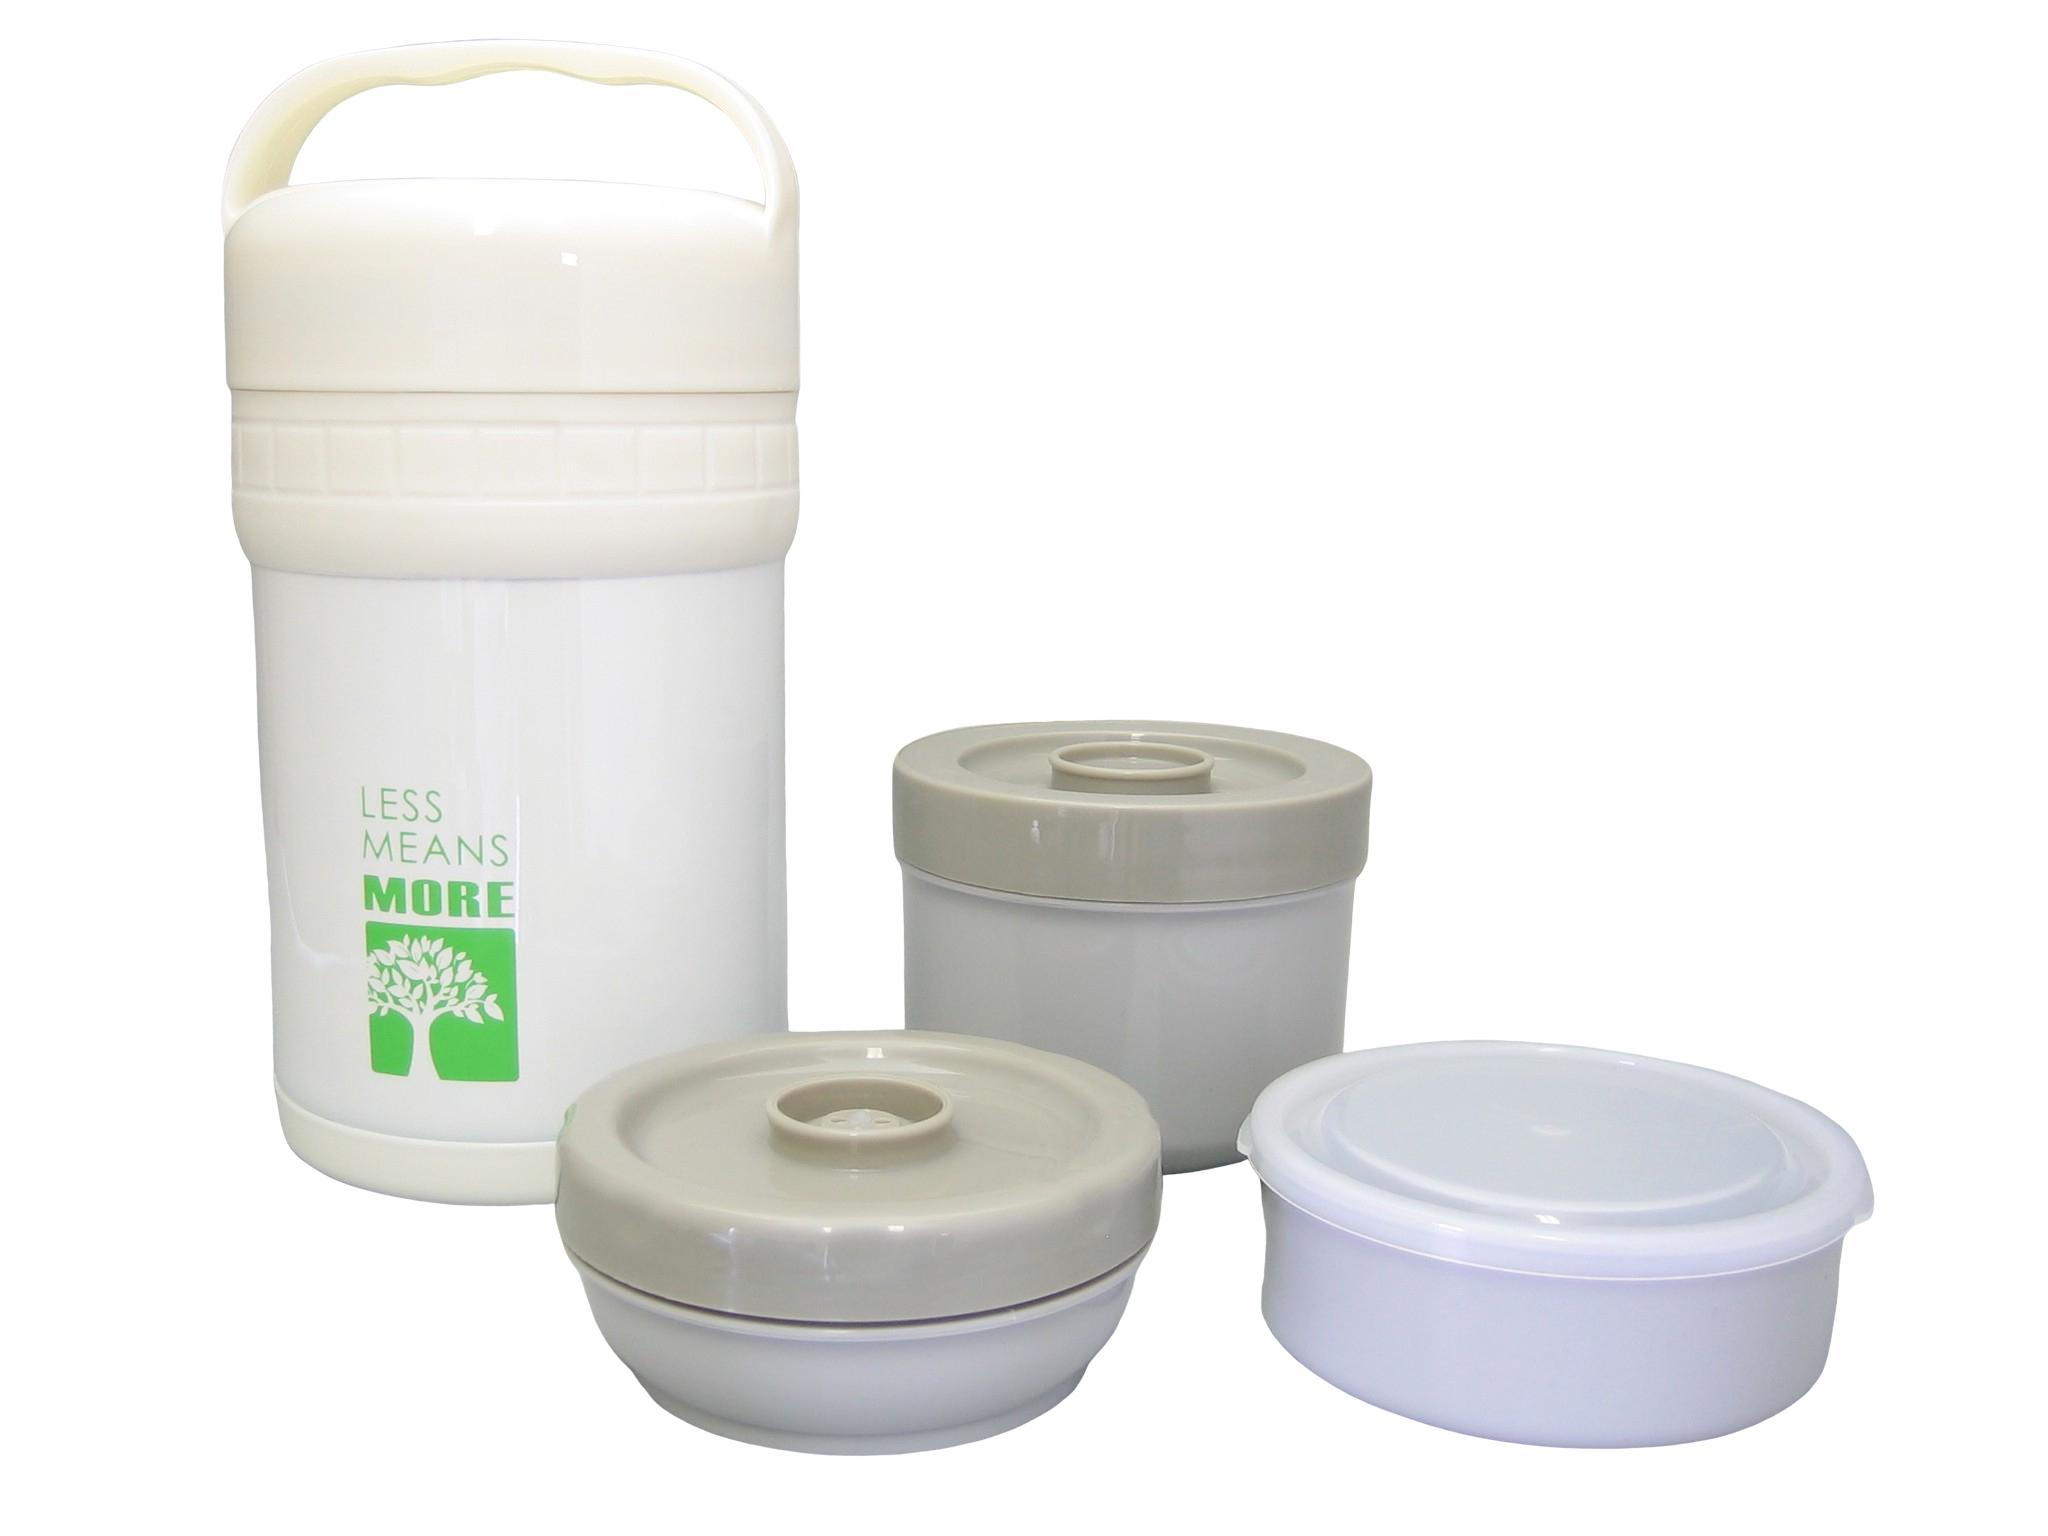 LUNCH15-001 - Voedseldrager RVS onbreekbaar wit 1.5 L - Isobel